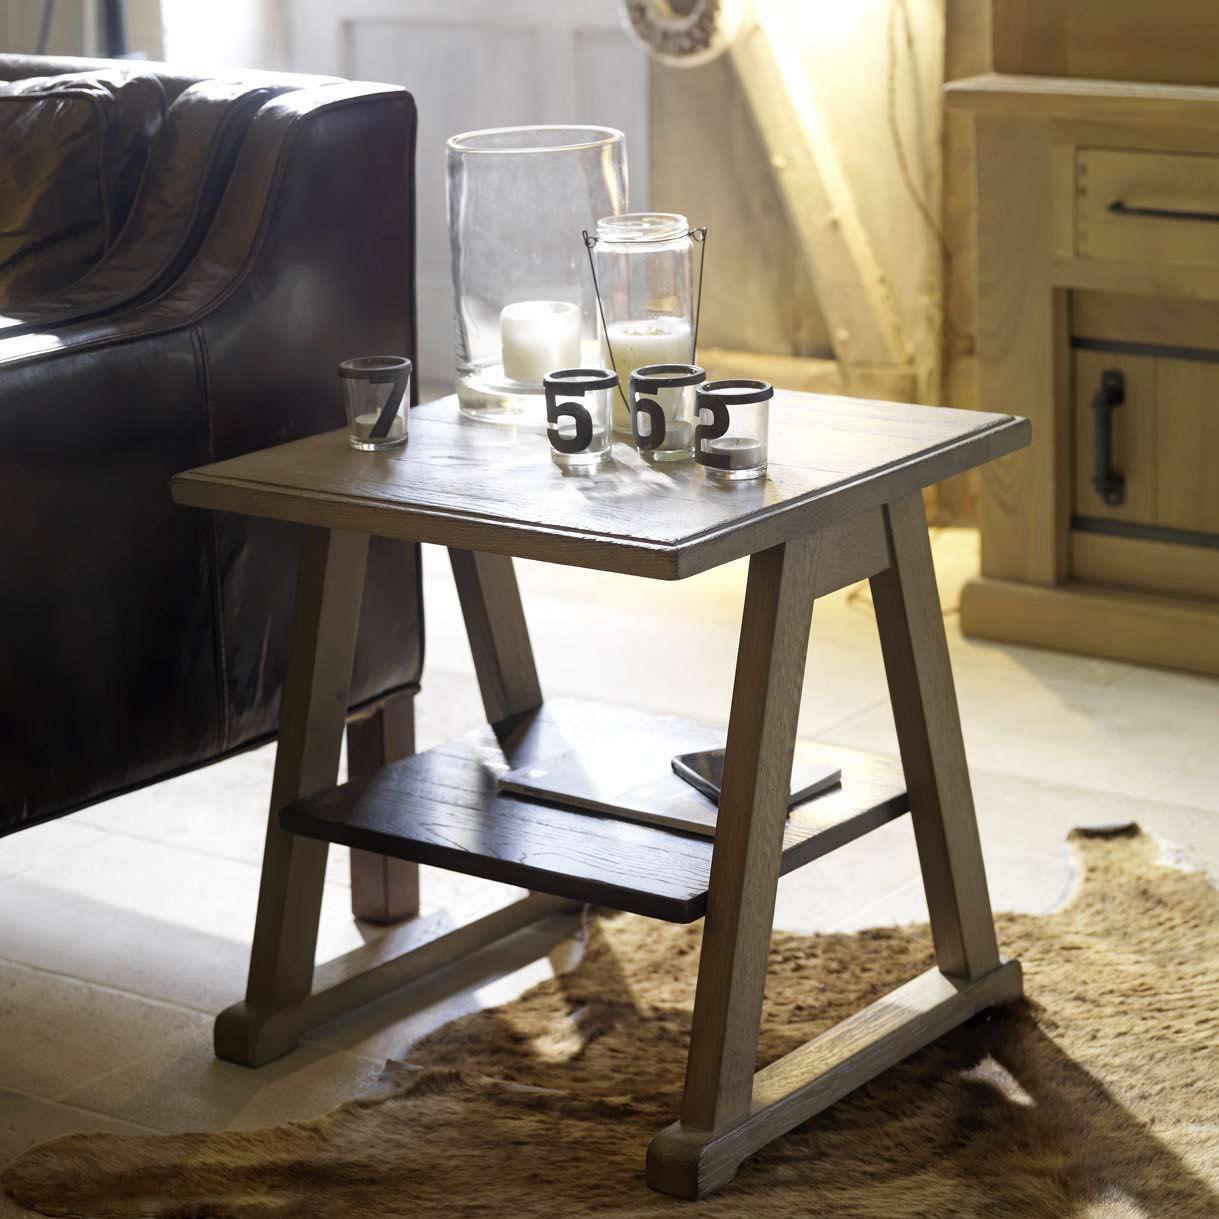 Klassischer Beistelltisch Holz Rechteckig Quadratisch